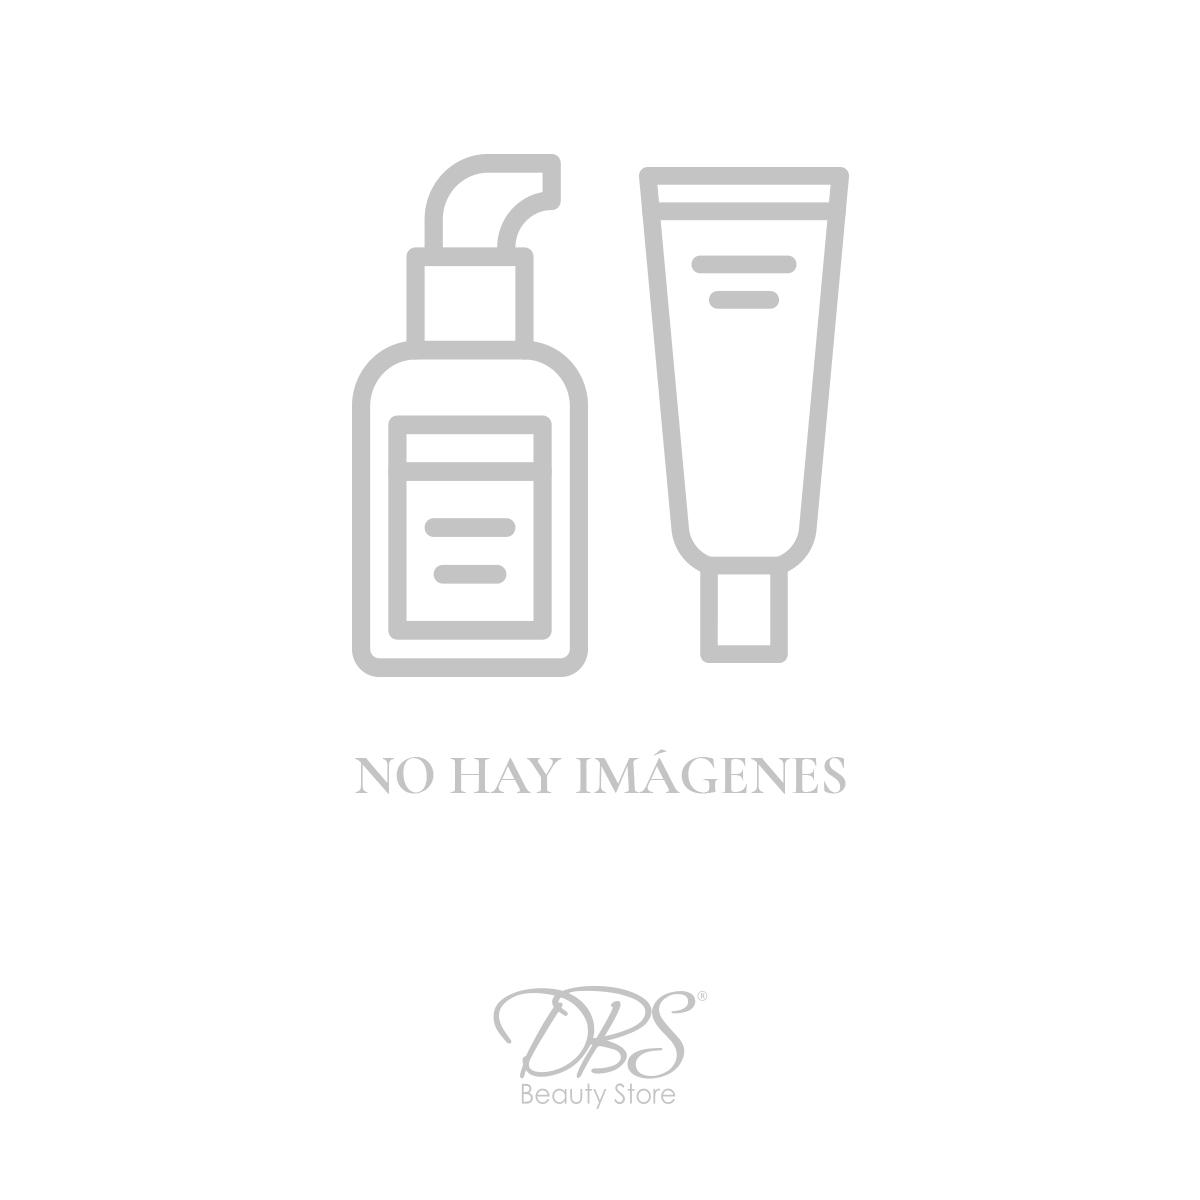 dbs-cosmetics-DBS-CDG5926-MP.jpg